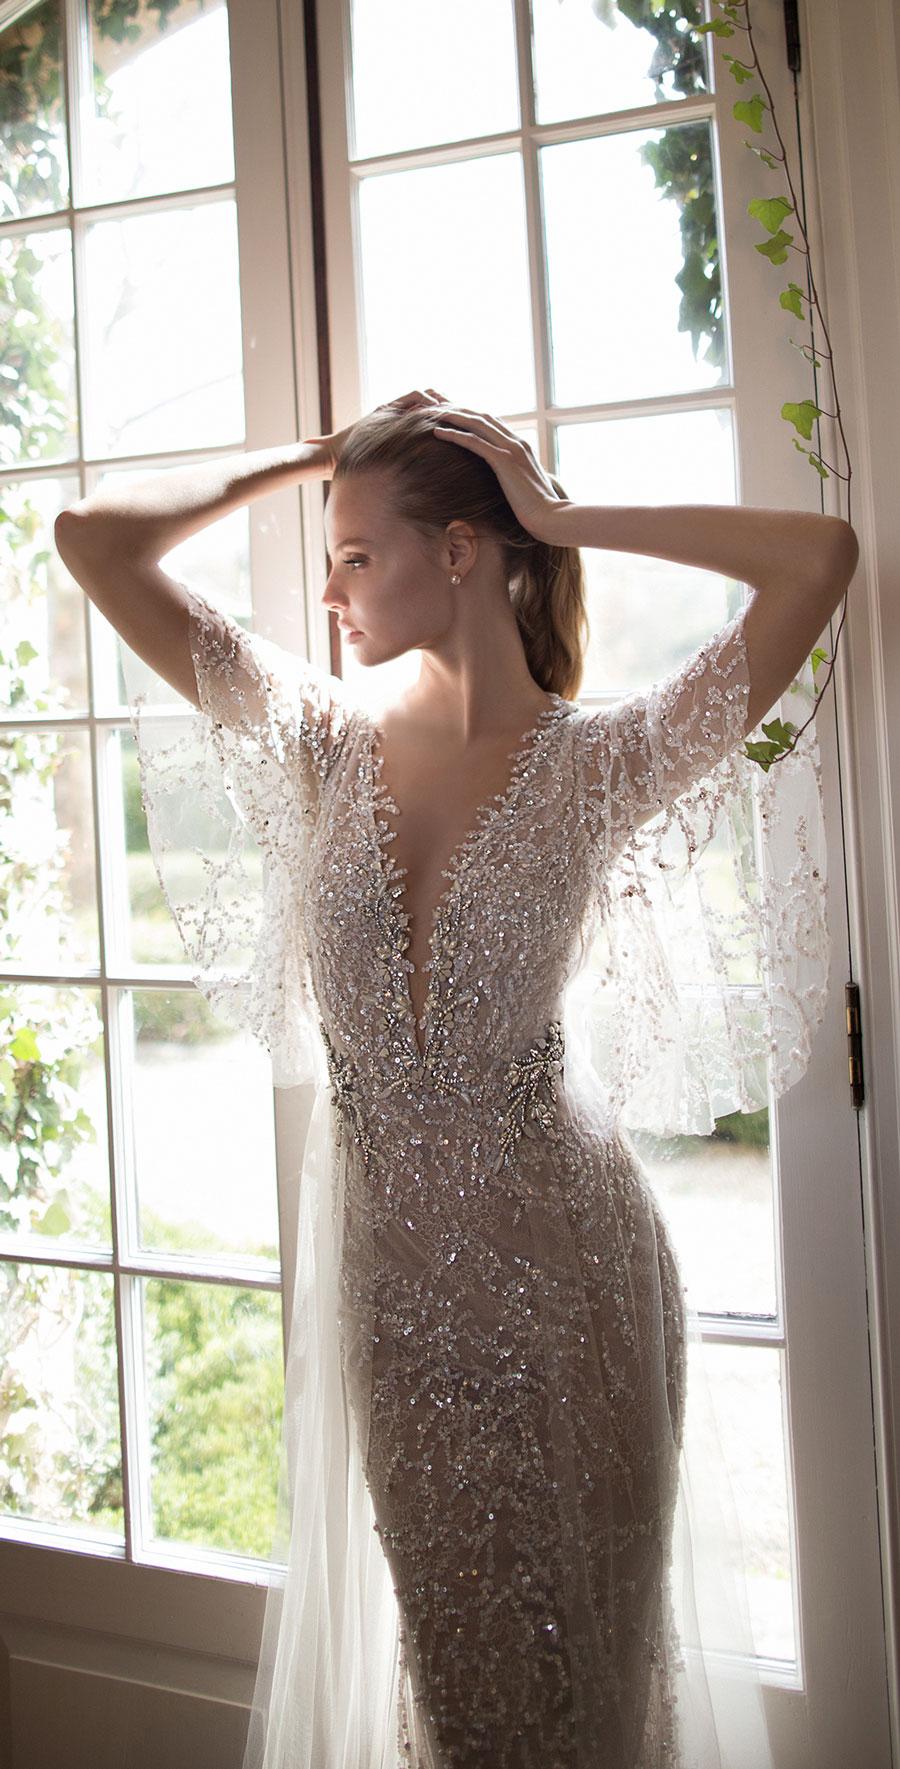 Berta-Bridal-Wedding-Dresses-Fall-Winter-2016-Bridal-Collection-00023